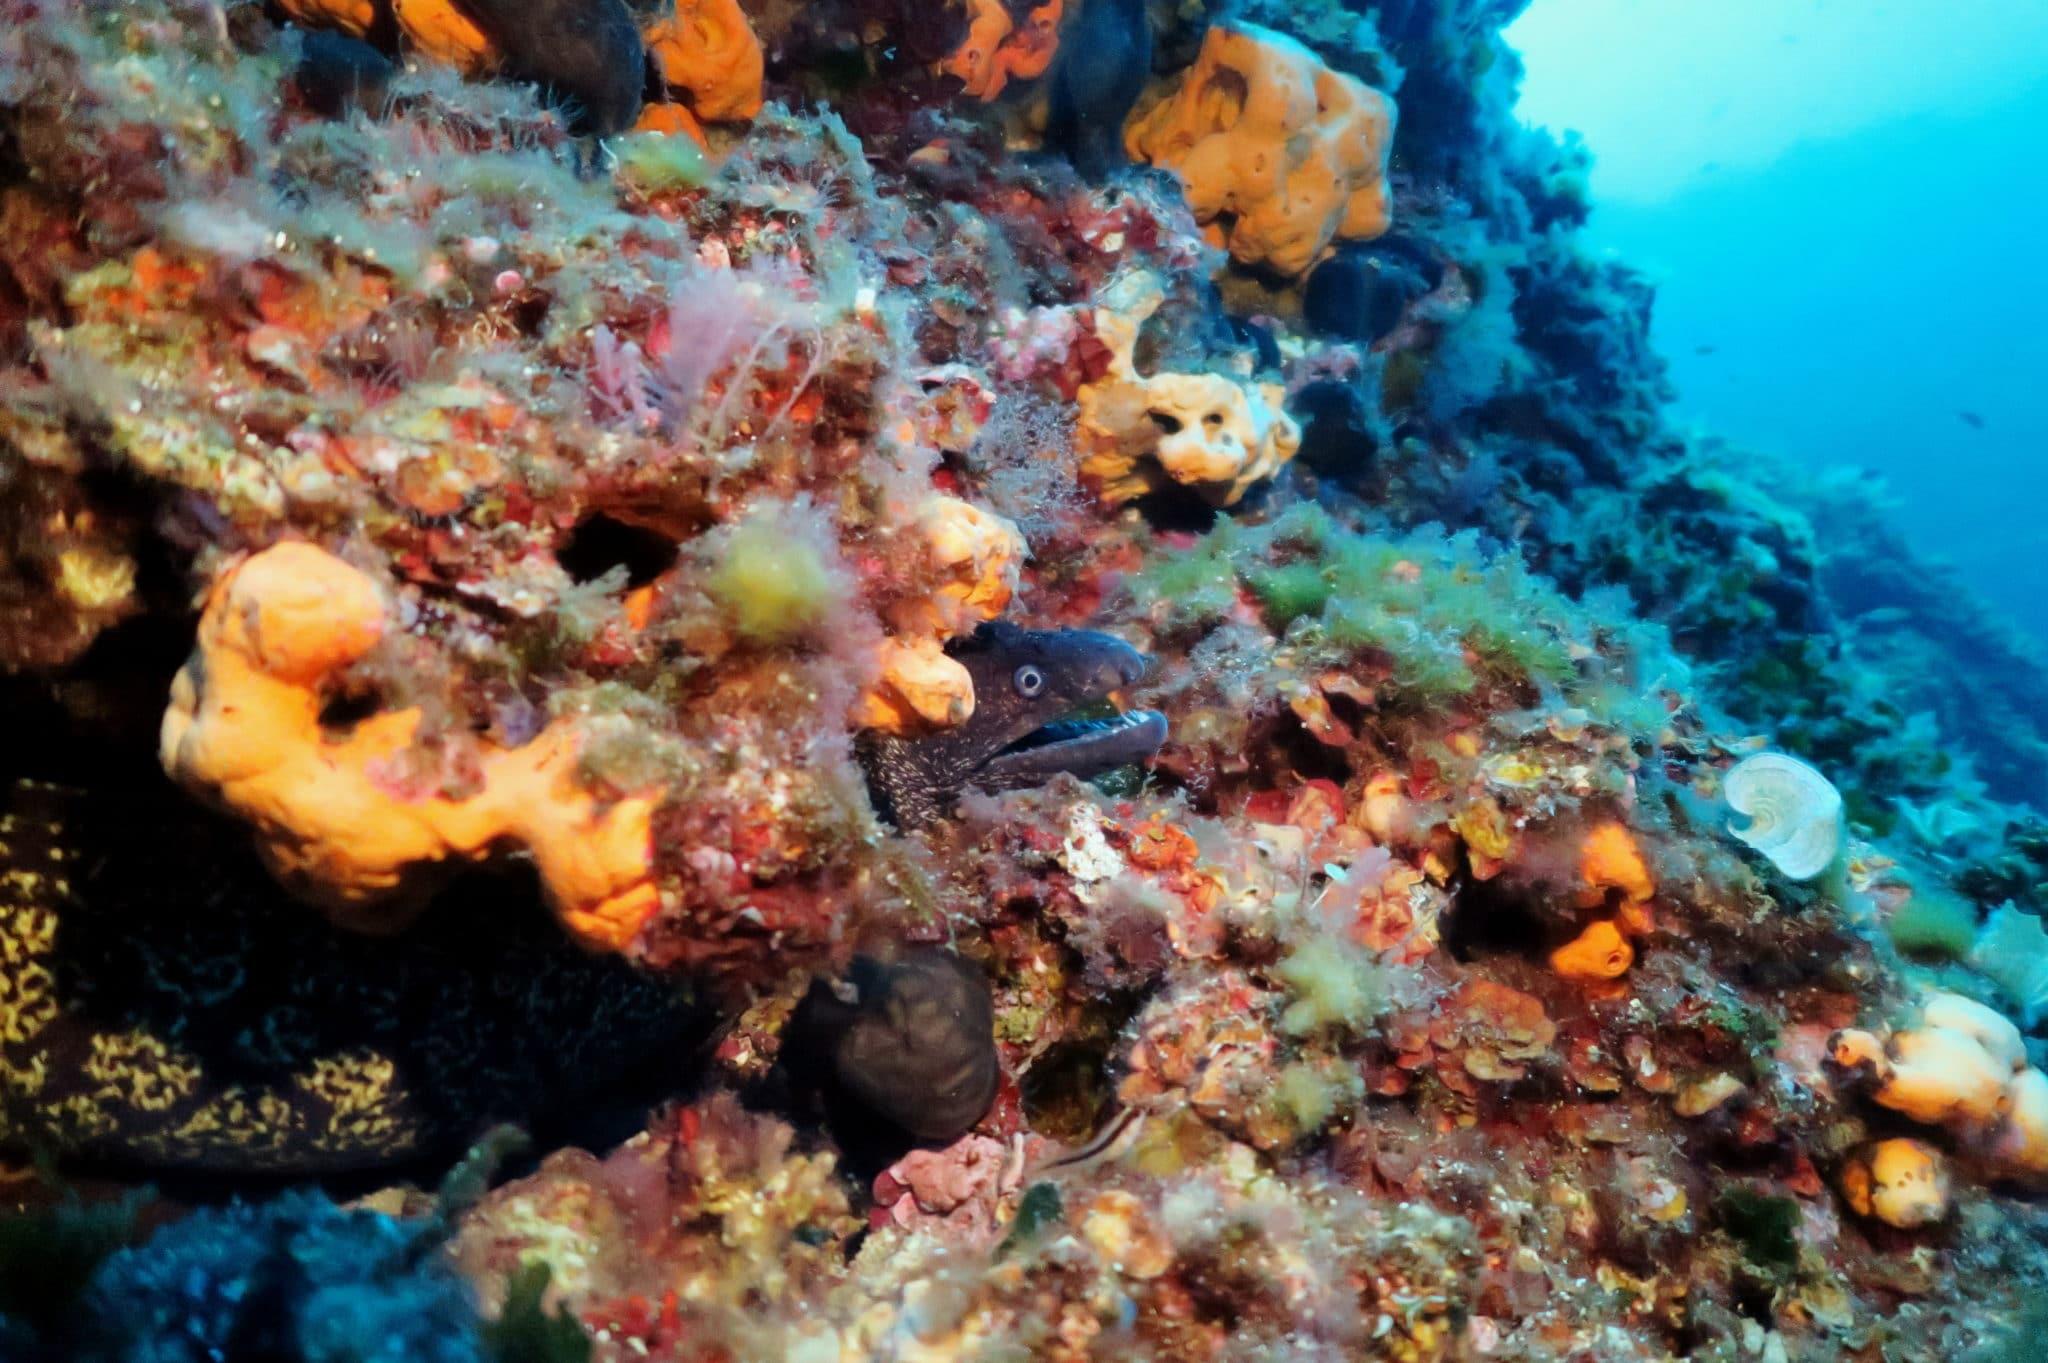 Scuba diving at Agios Georgios Reef Alonissos Greece